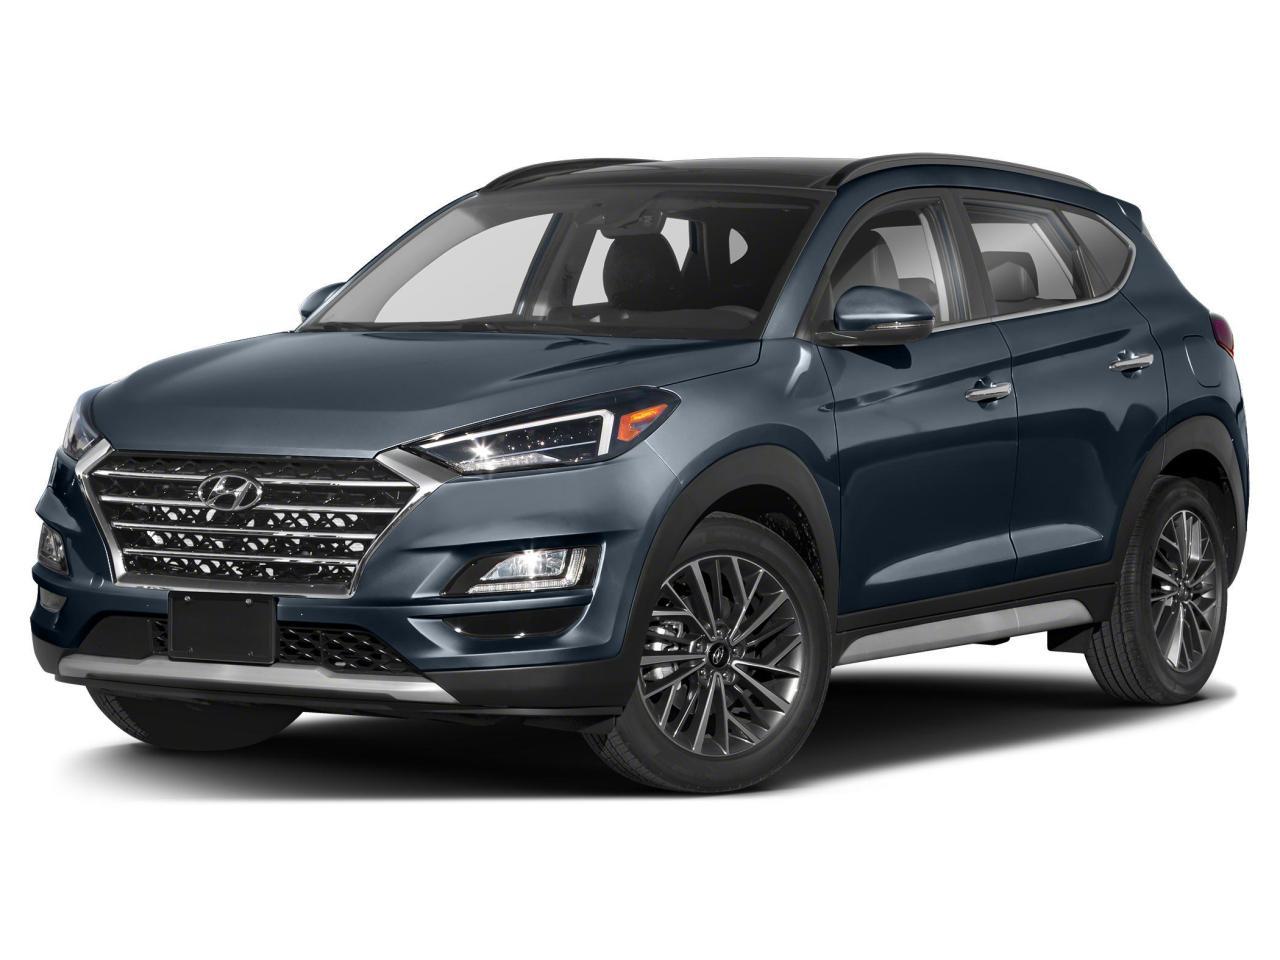 2021 Hyundai Tucson 2.4L AWD Ultimate NO OPTIONS